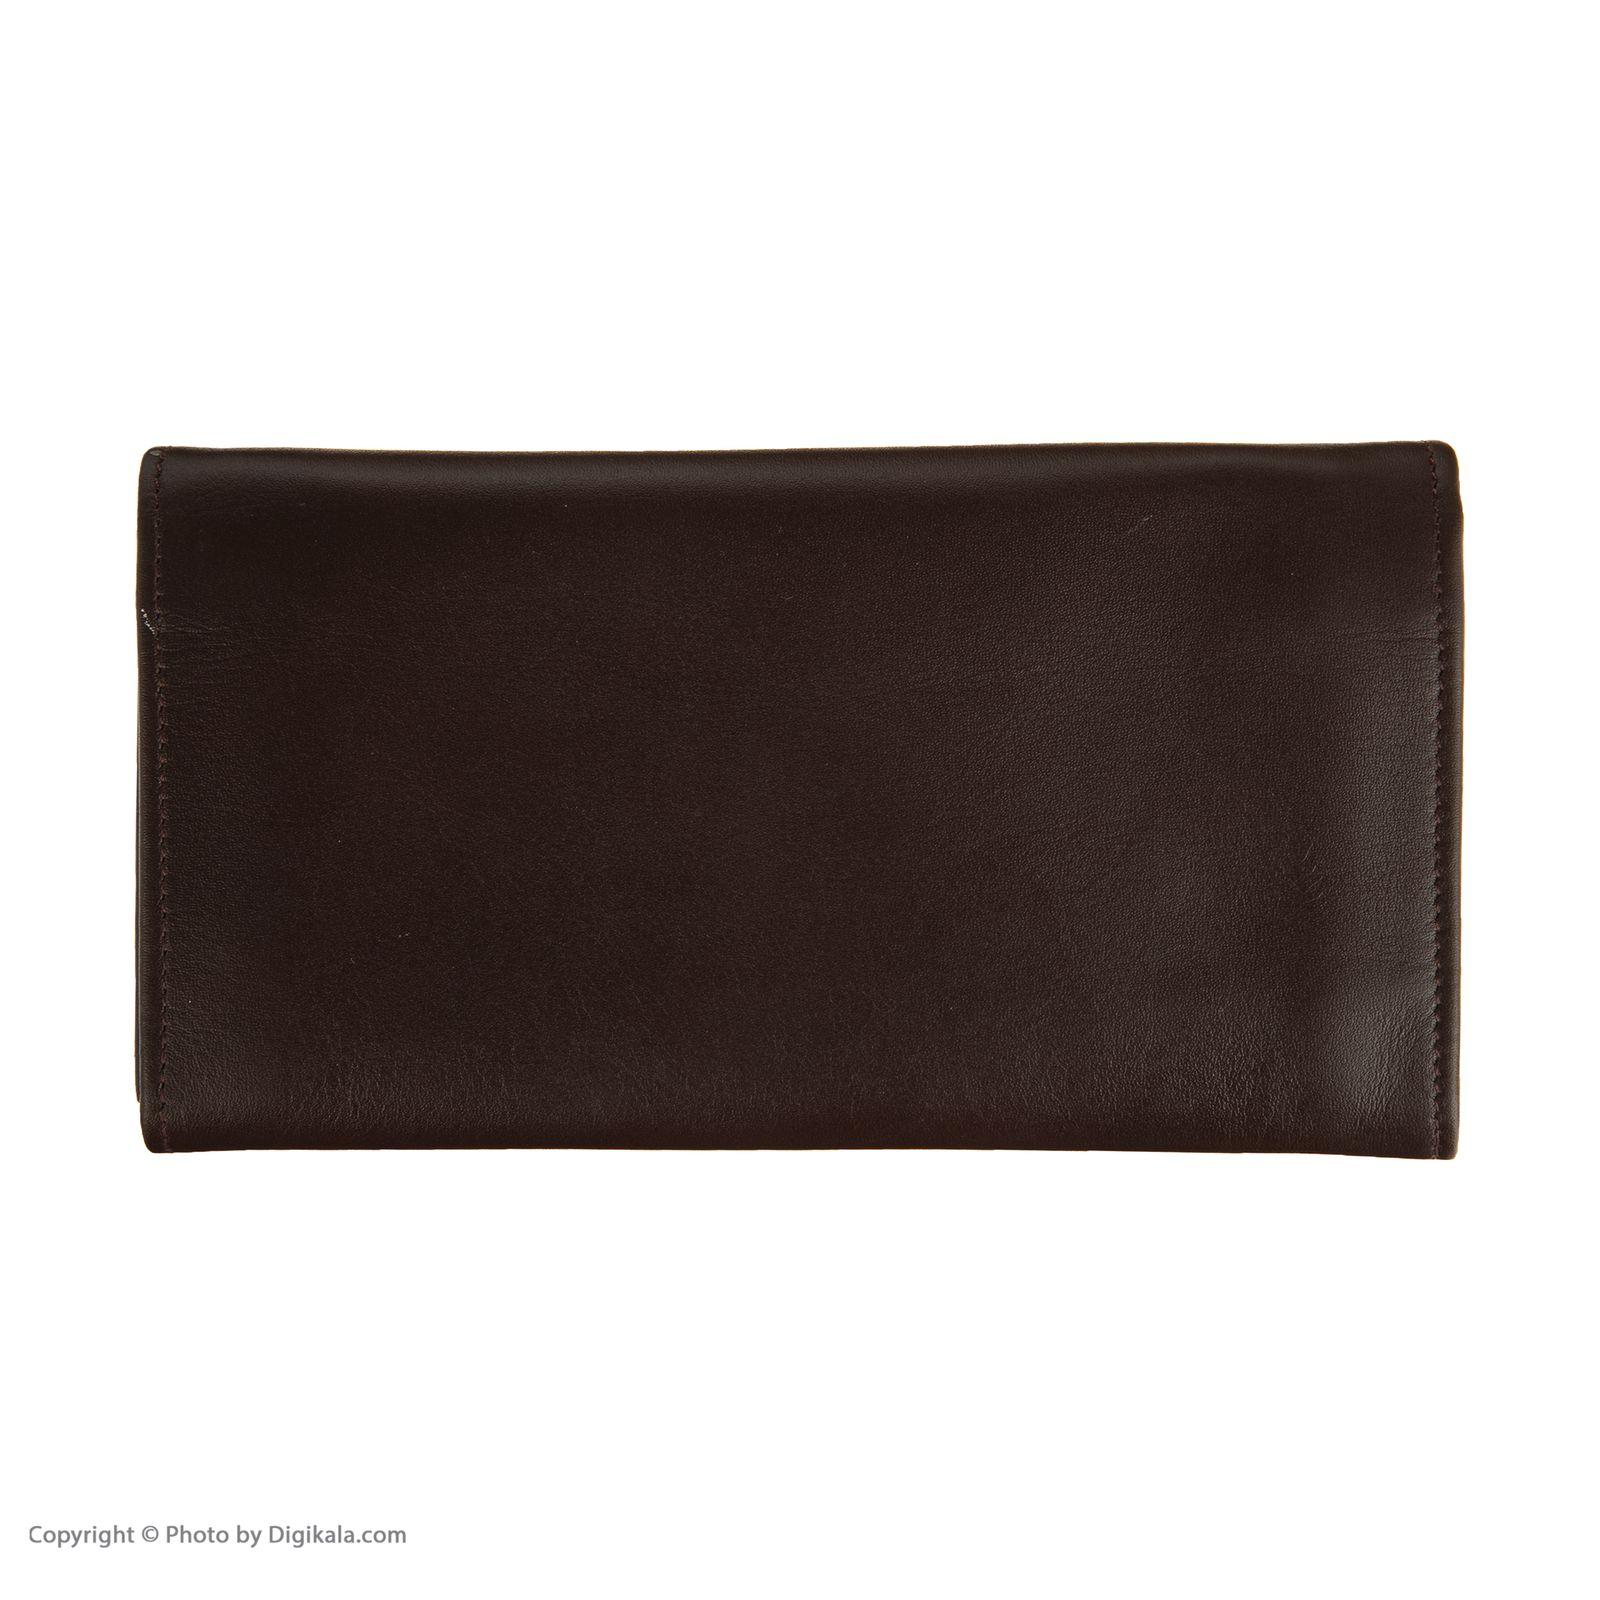 کیف پول چرمیران مدل 6059701 -  - 4